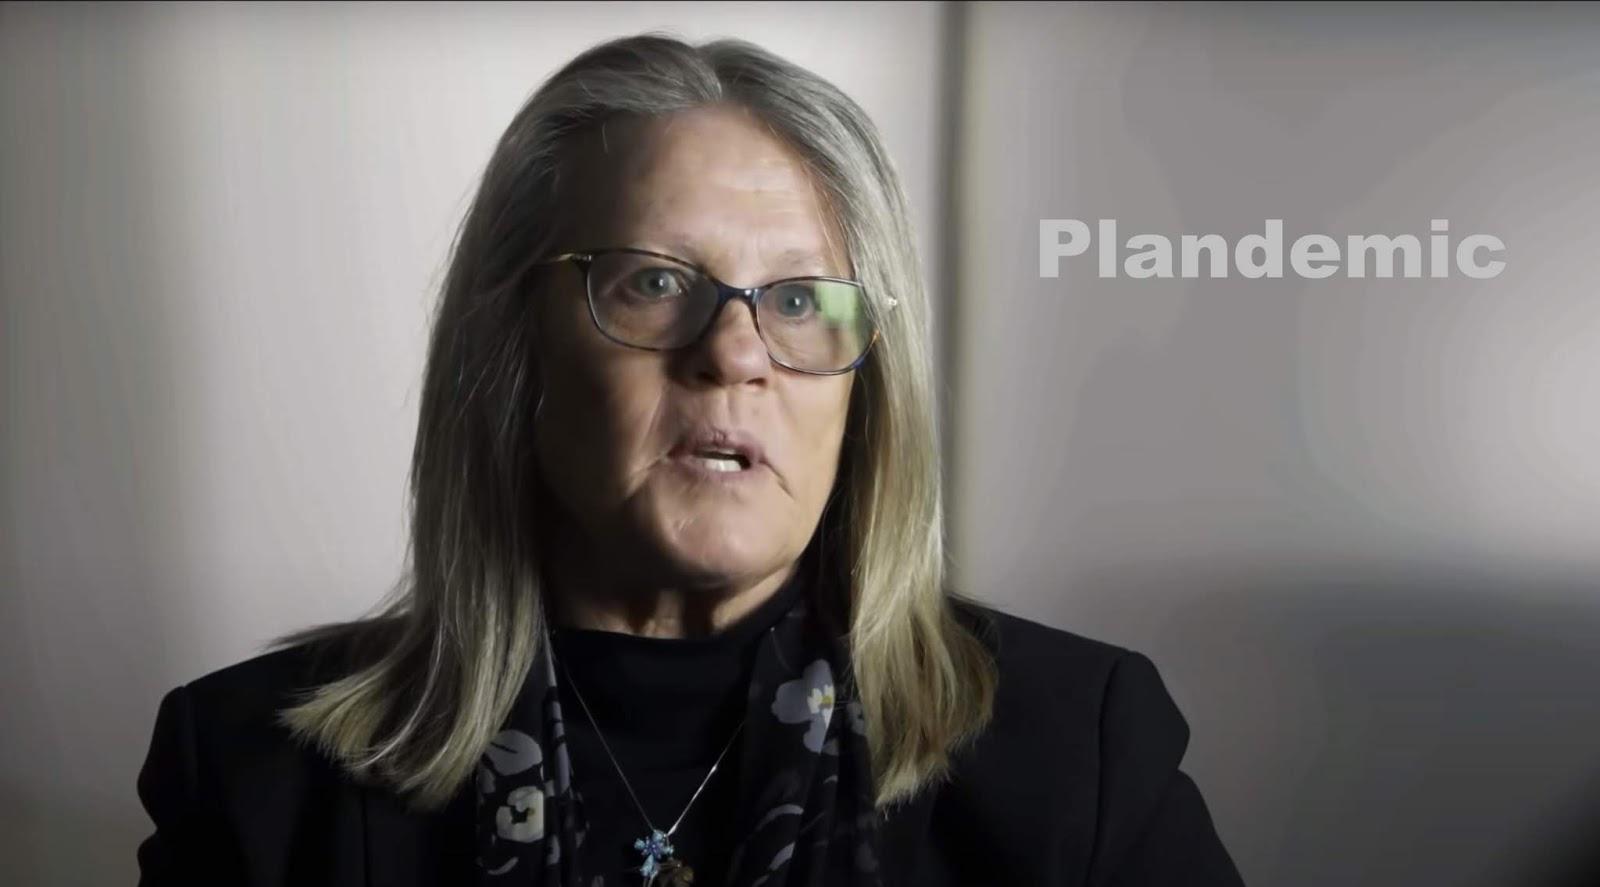 Plandemic: A conspiração contra a cientista Dra. Judy Anne Mikovits